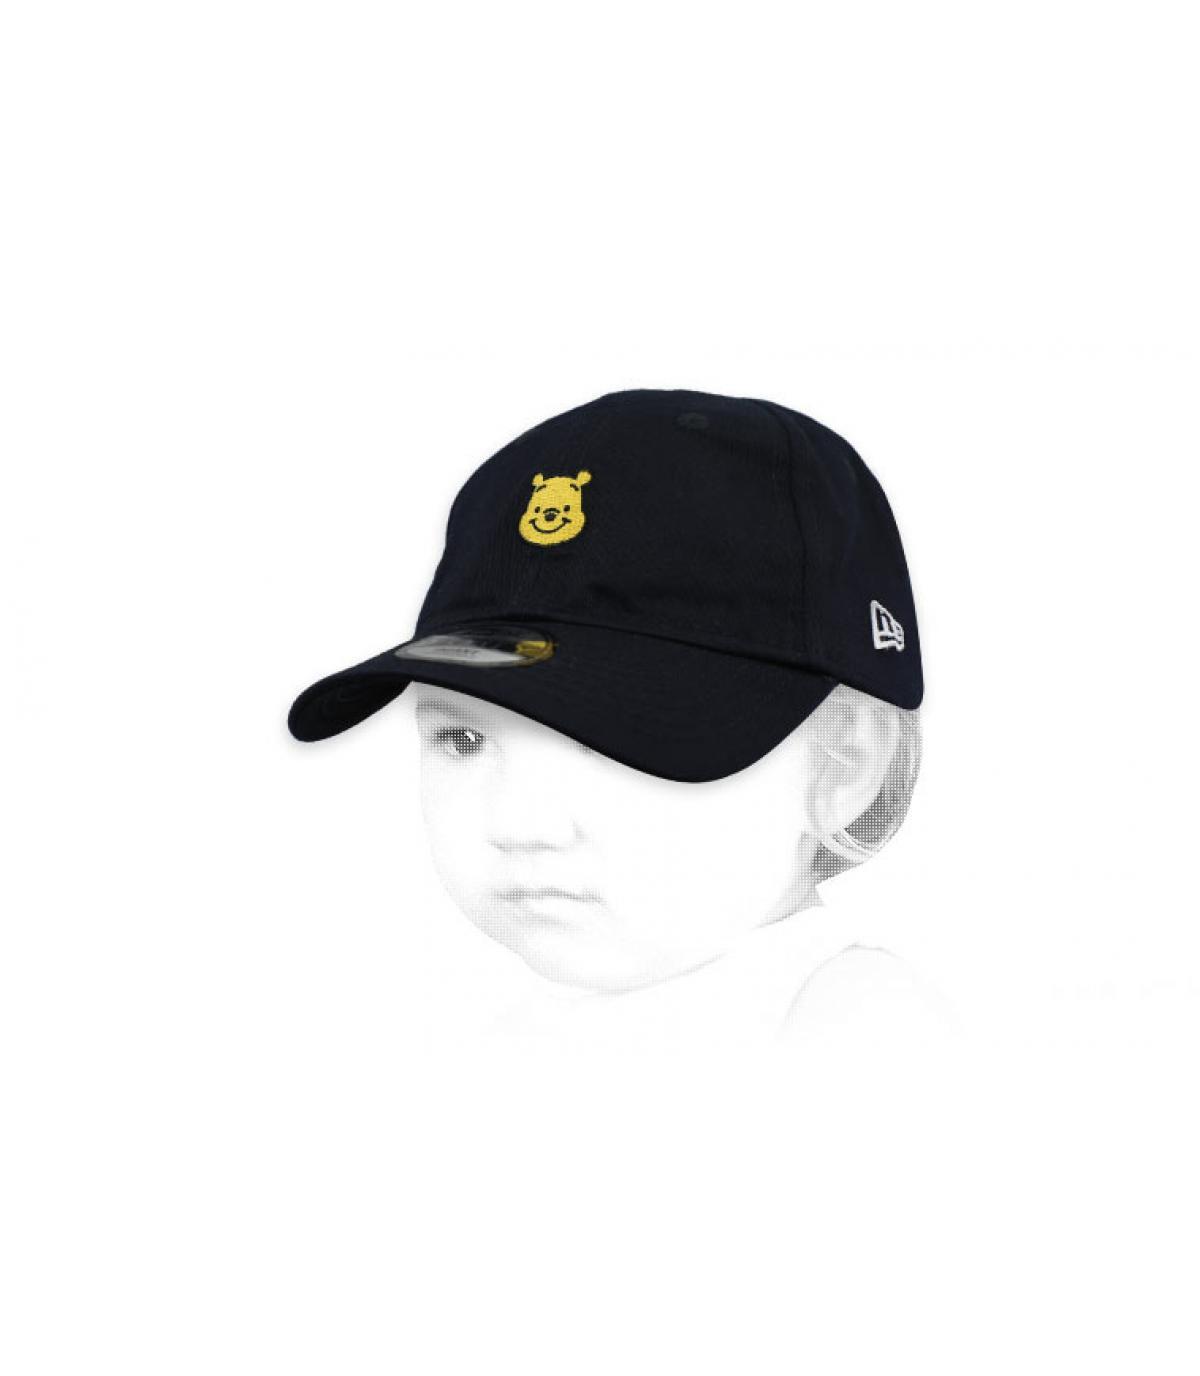 casquette bébé Winnie noir